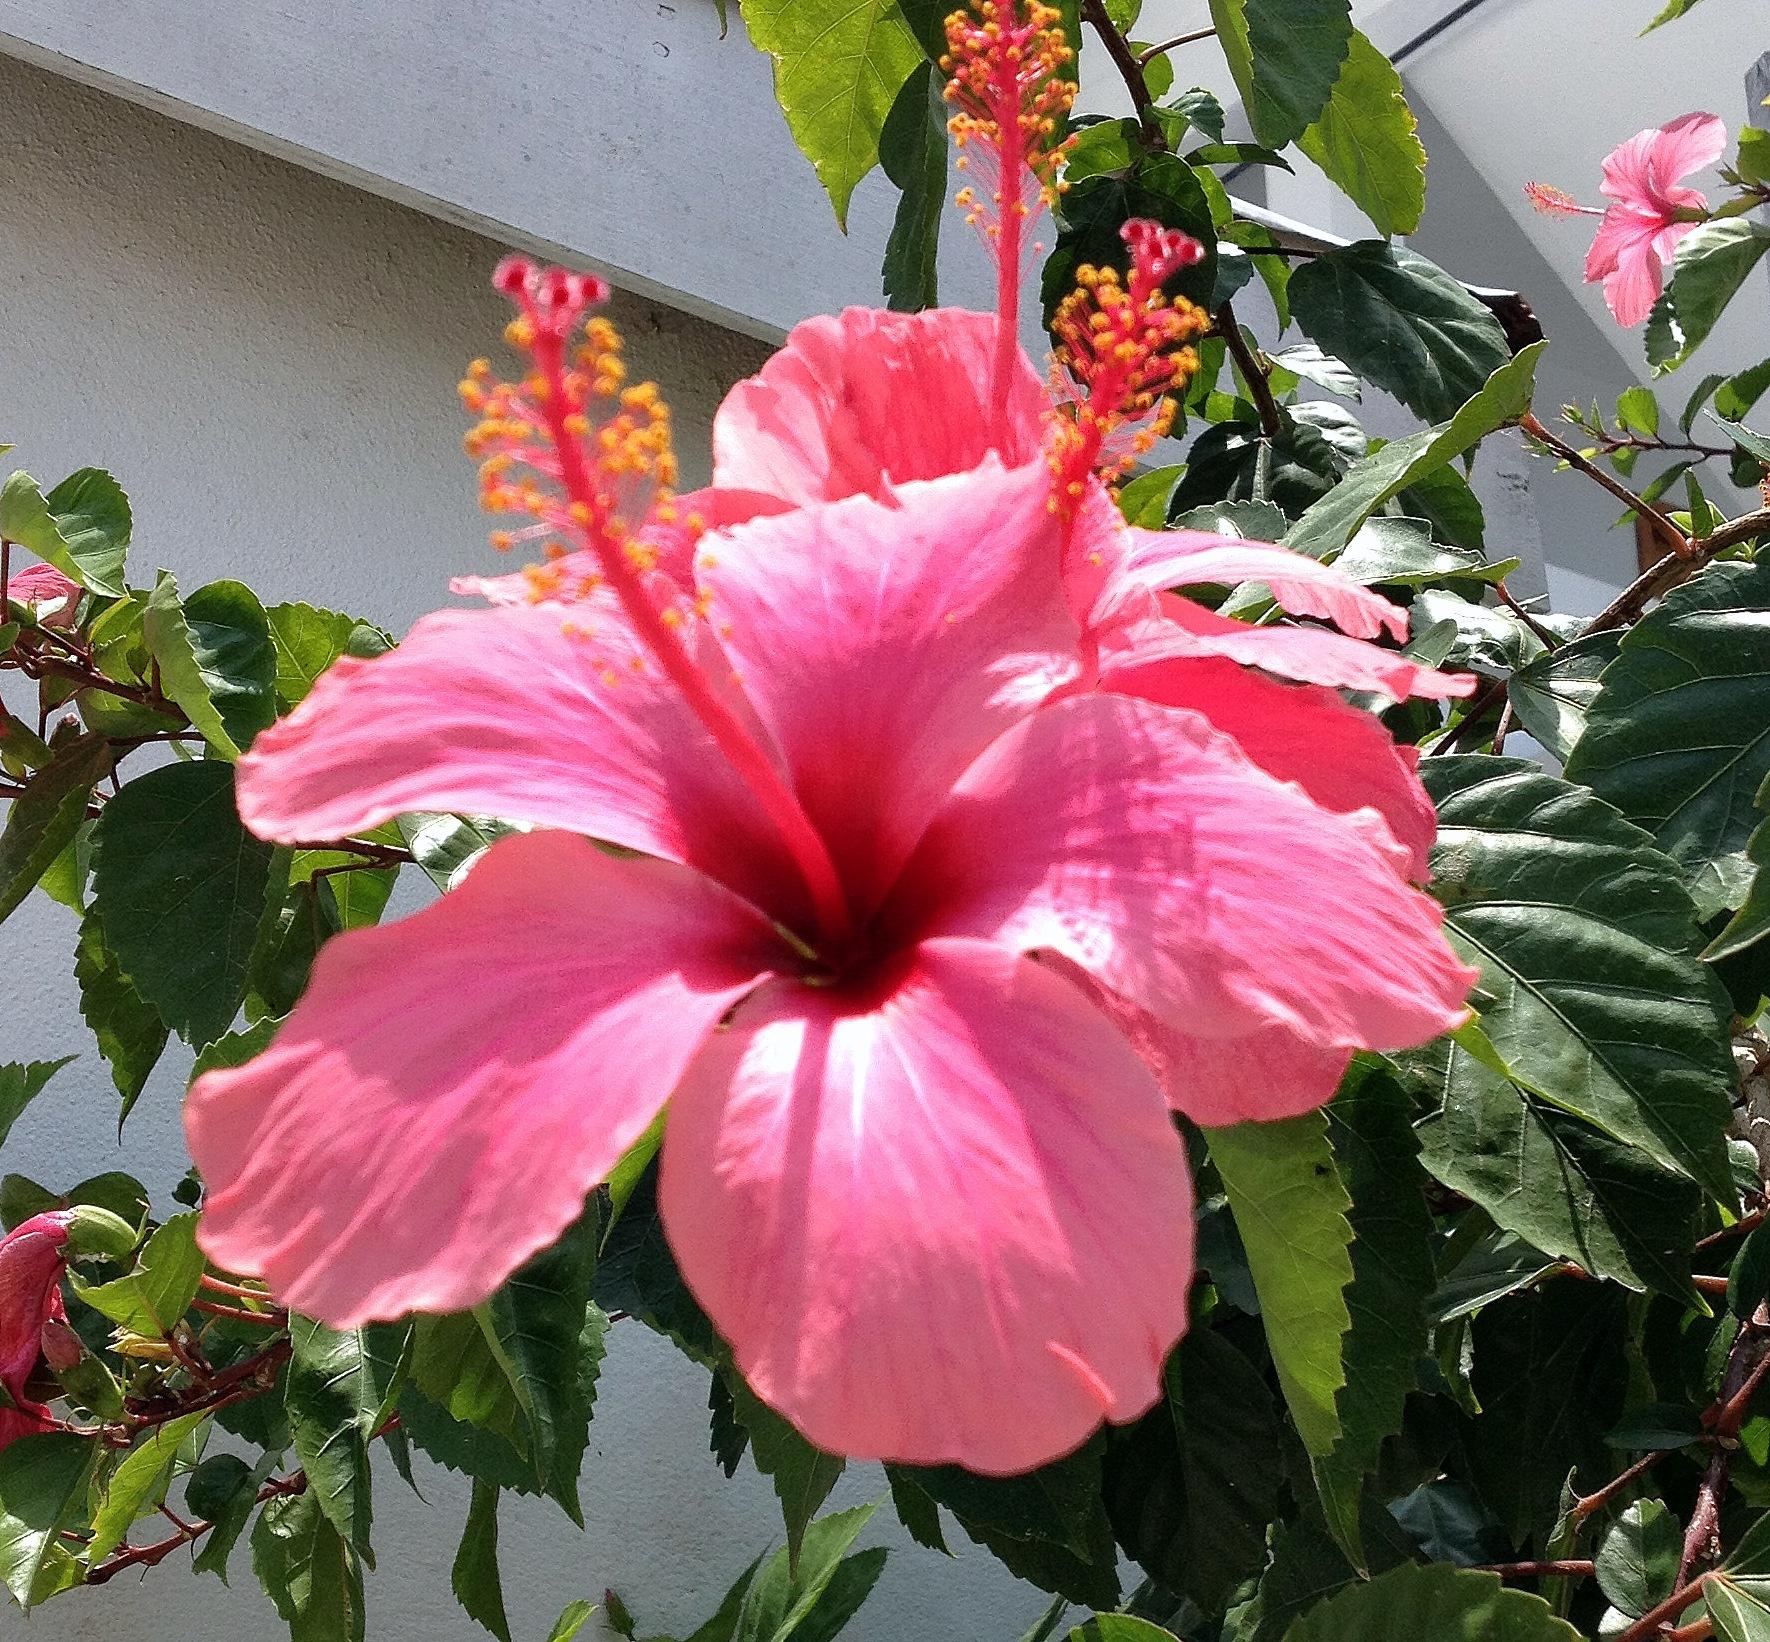 flower by sandilands55